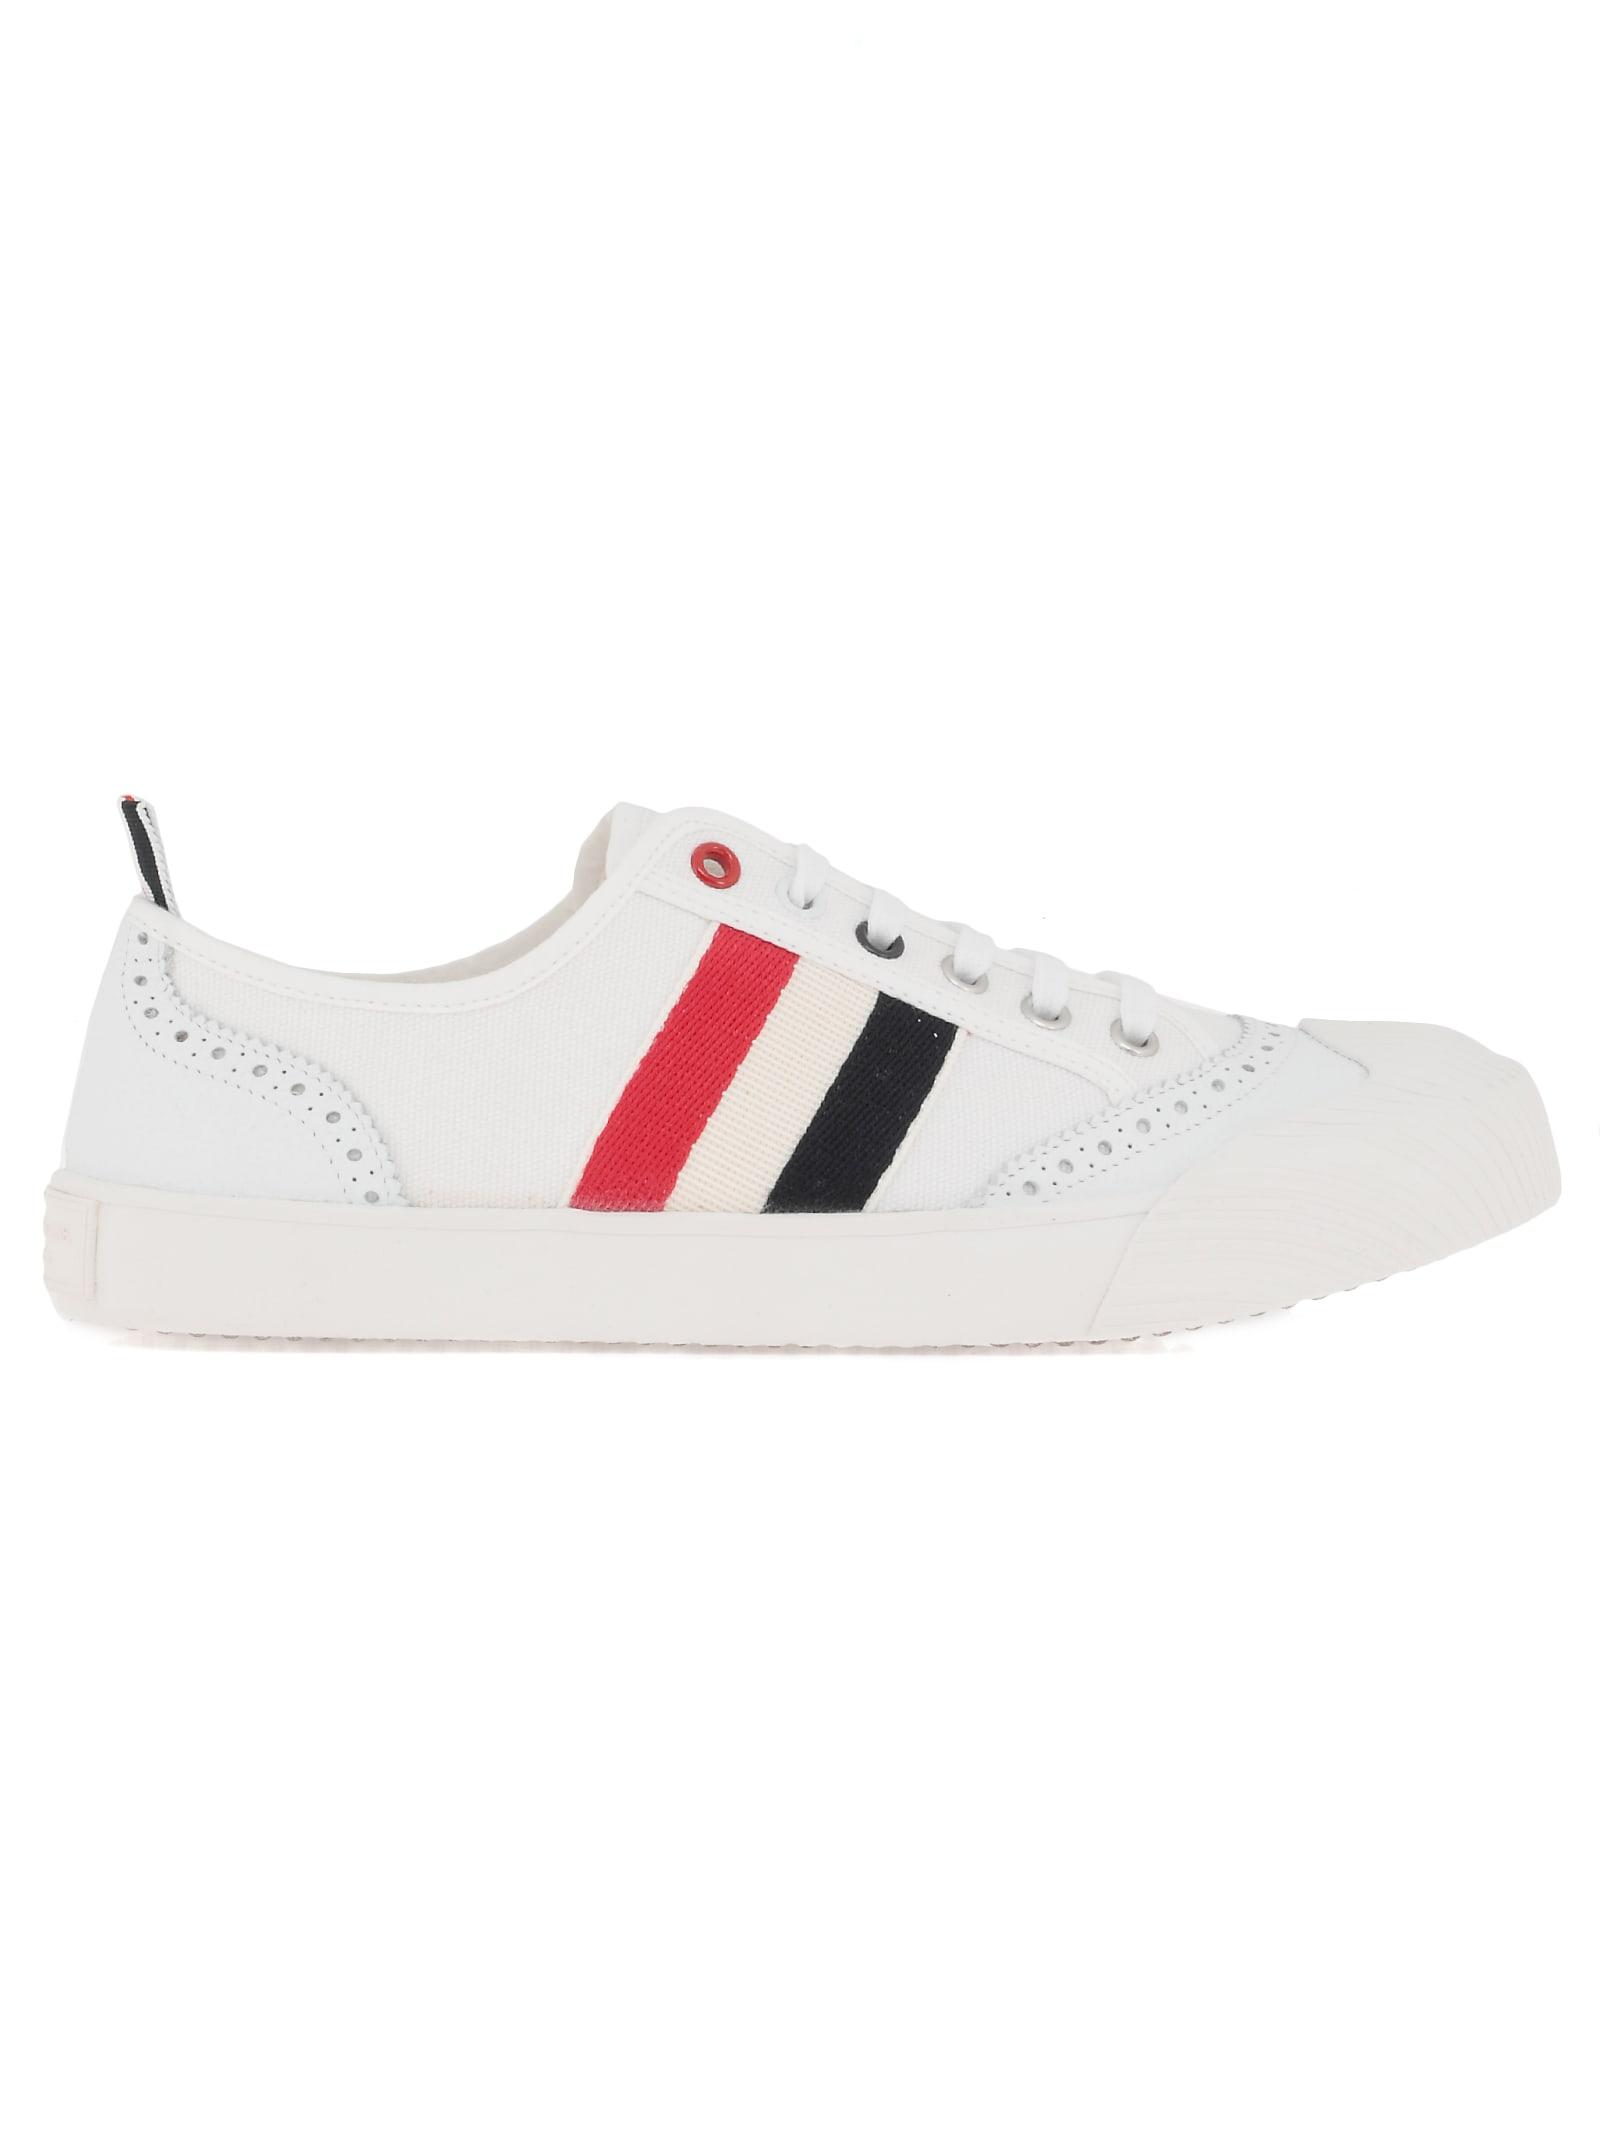 Thom Browne Lo-top Sneaker